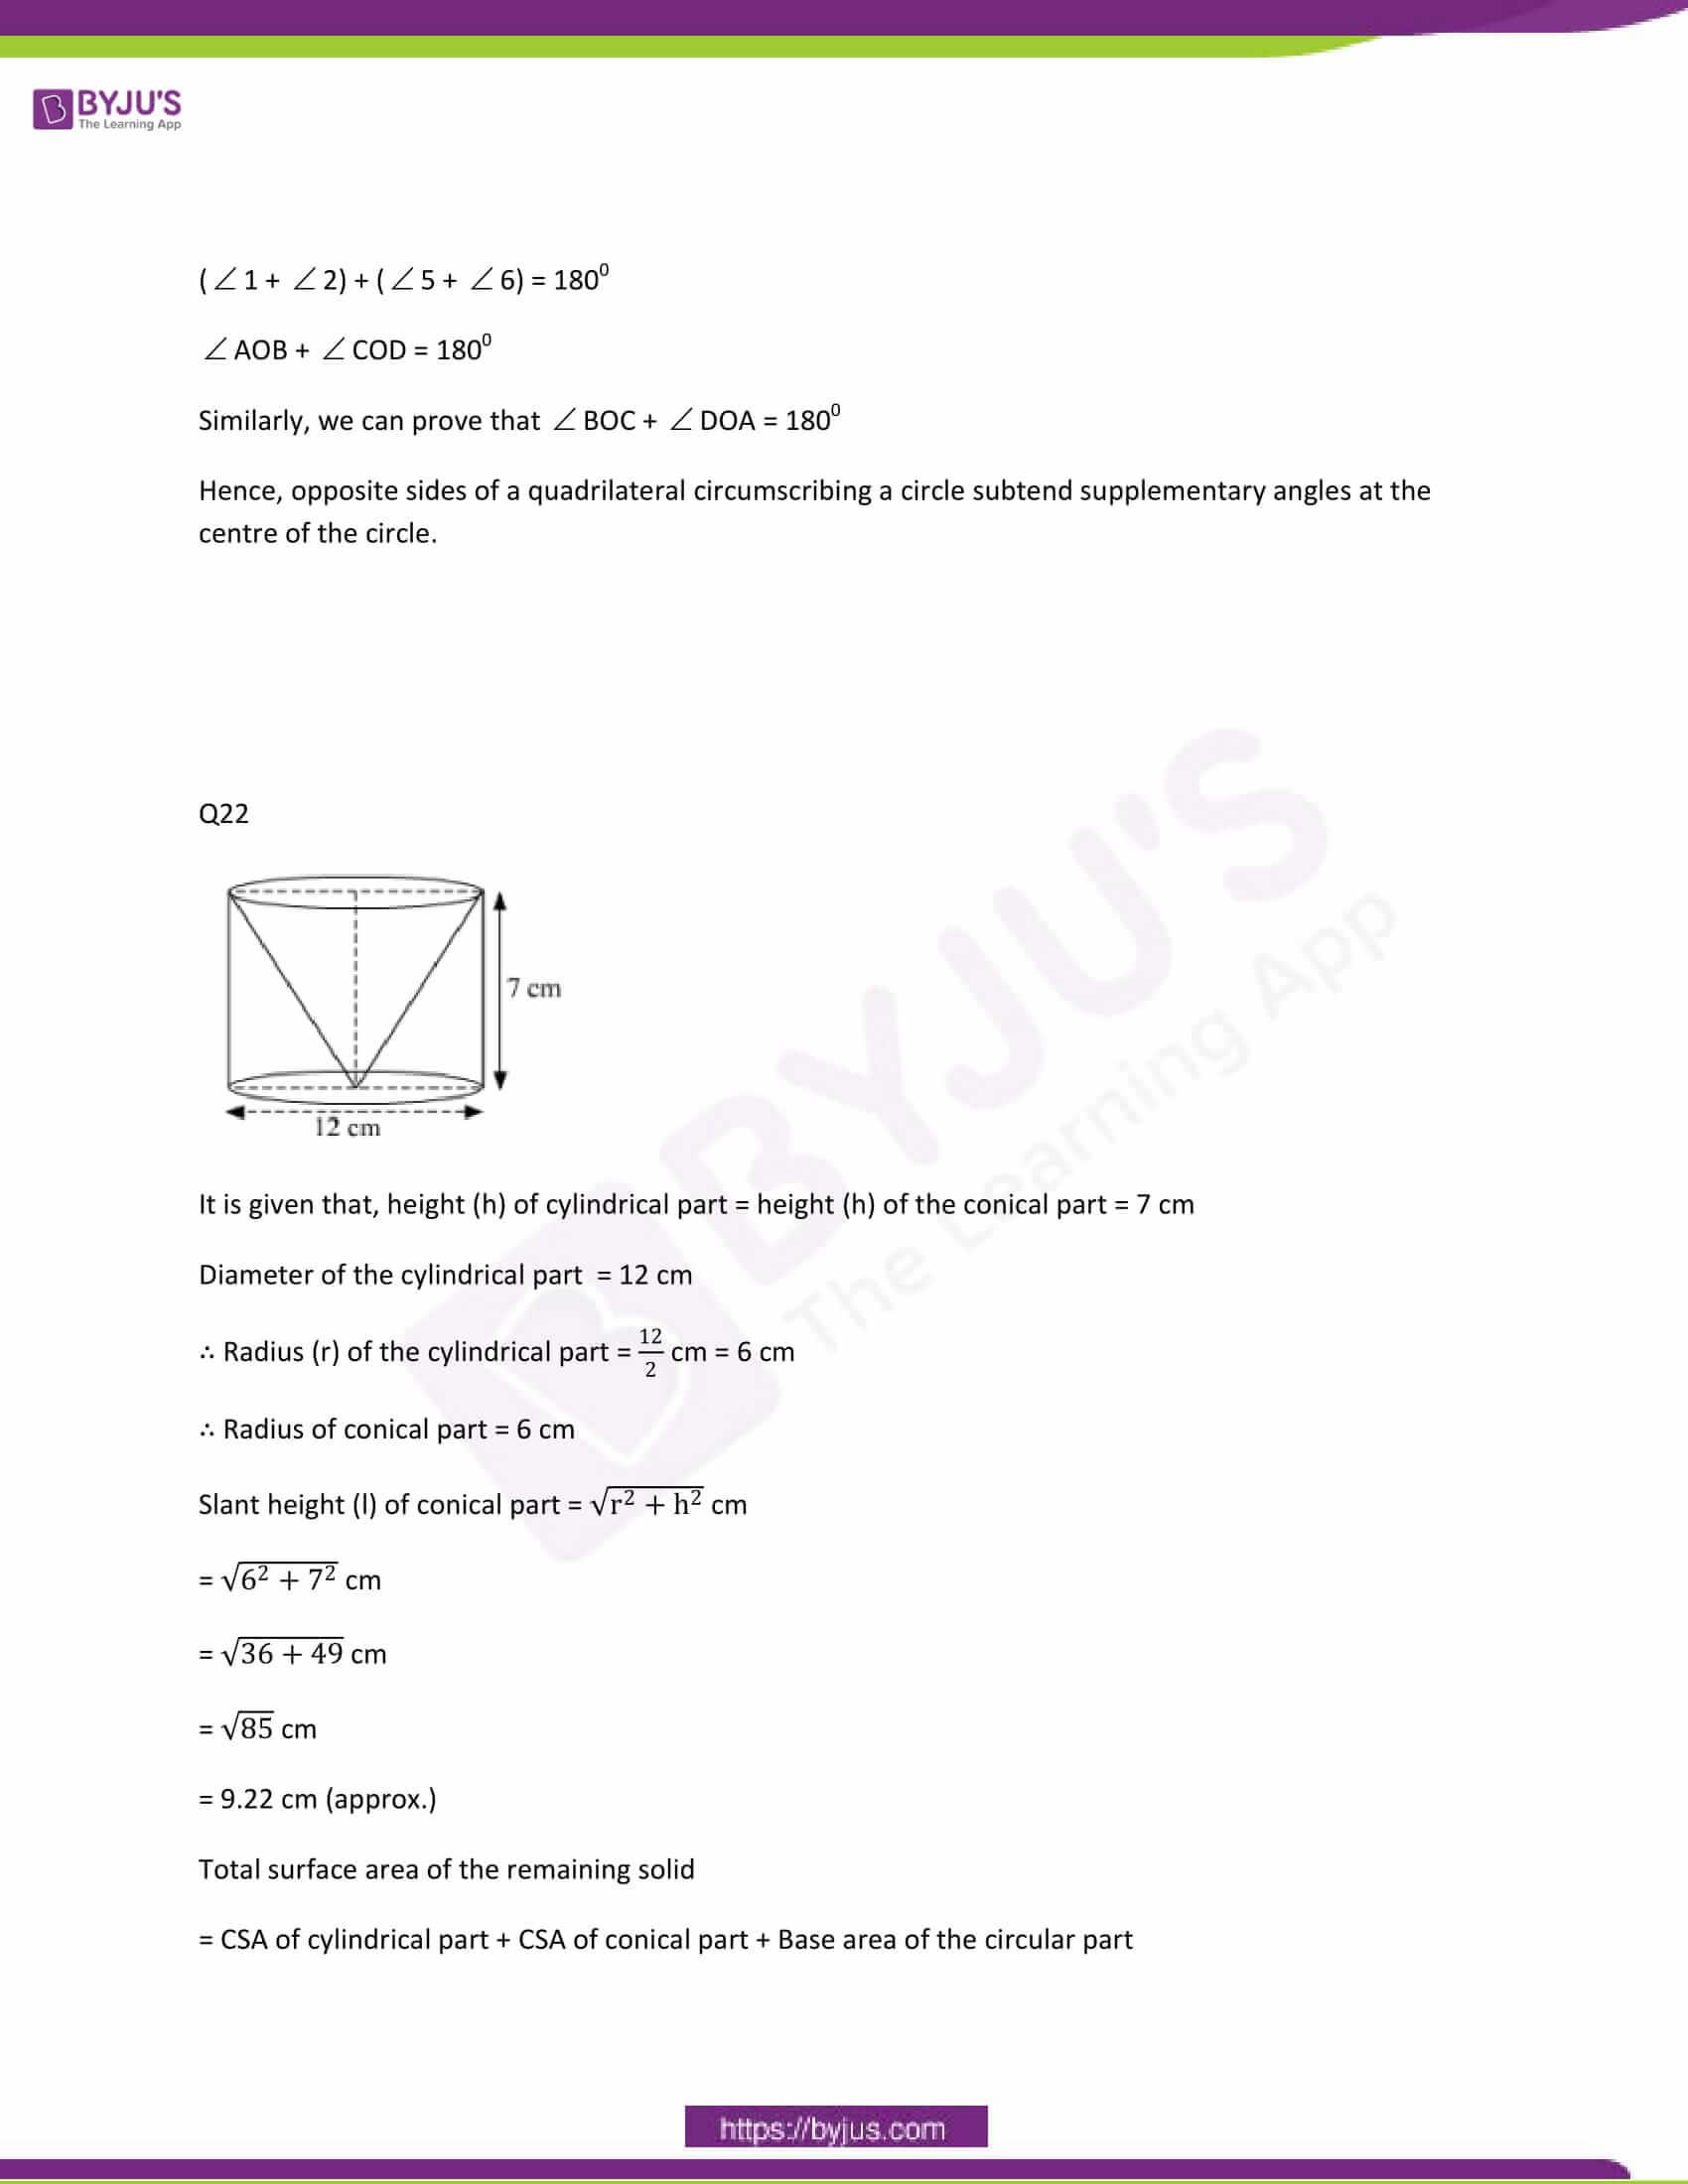 CBSE Class 10 Maths Papers Solution 2012 17